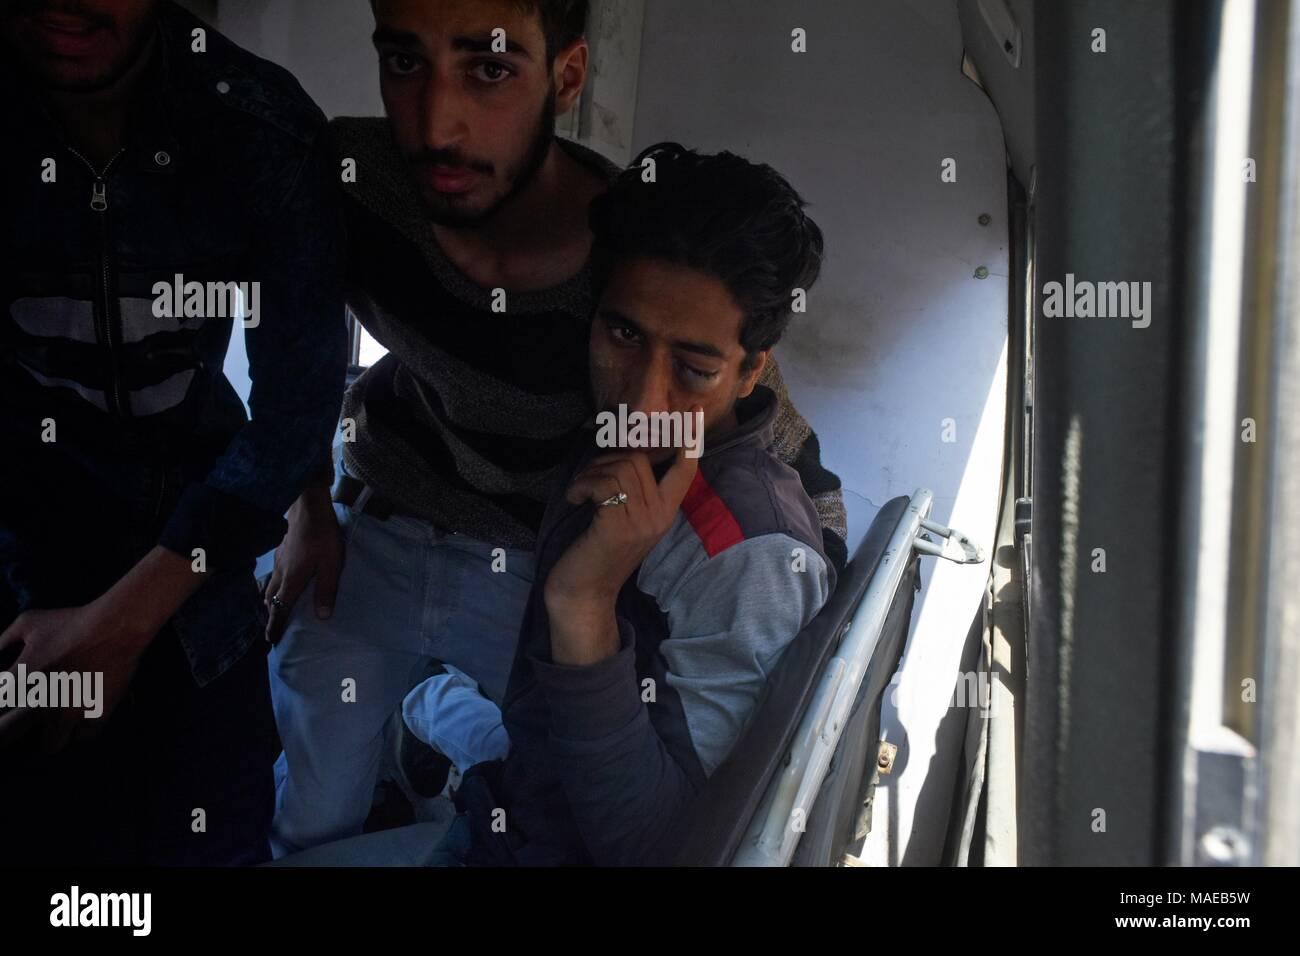 Srinagar, India  1st Apr, 2018  A civilian with an eye injury caused